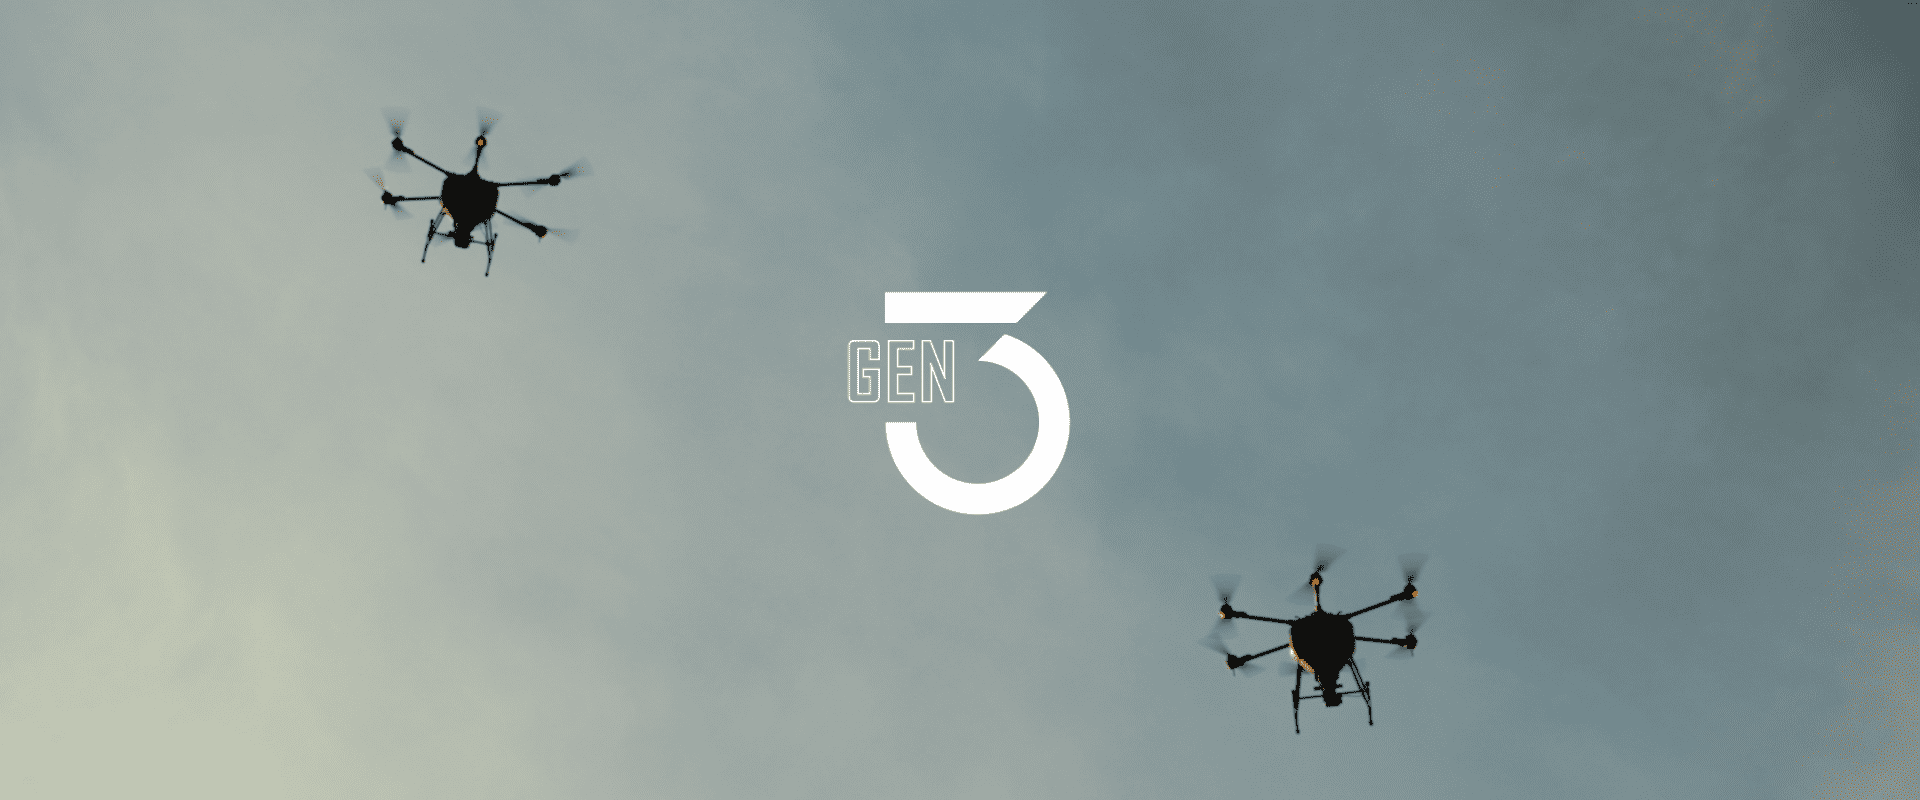 We are introducing Gen 3!